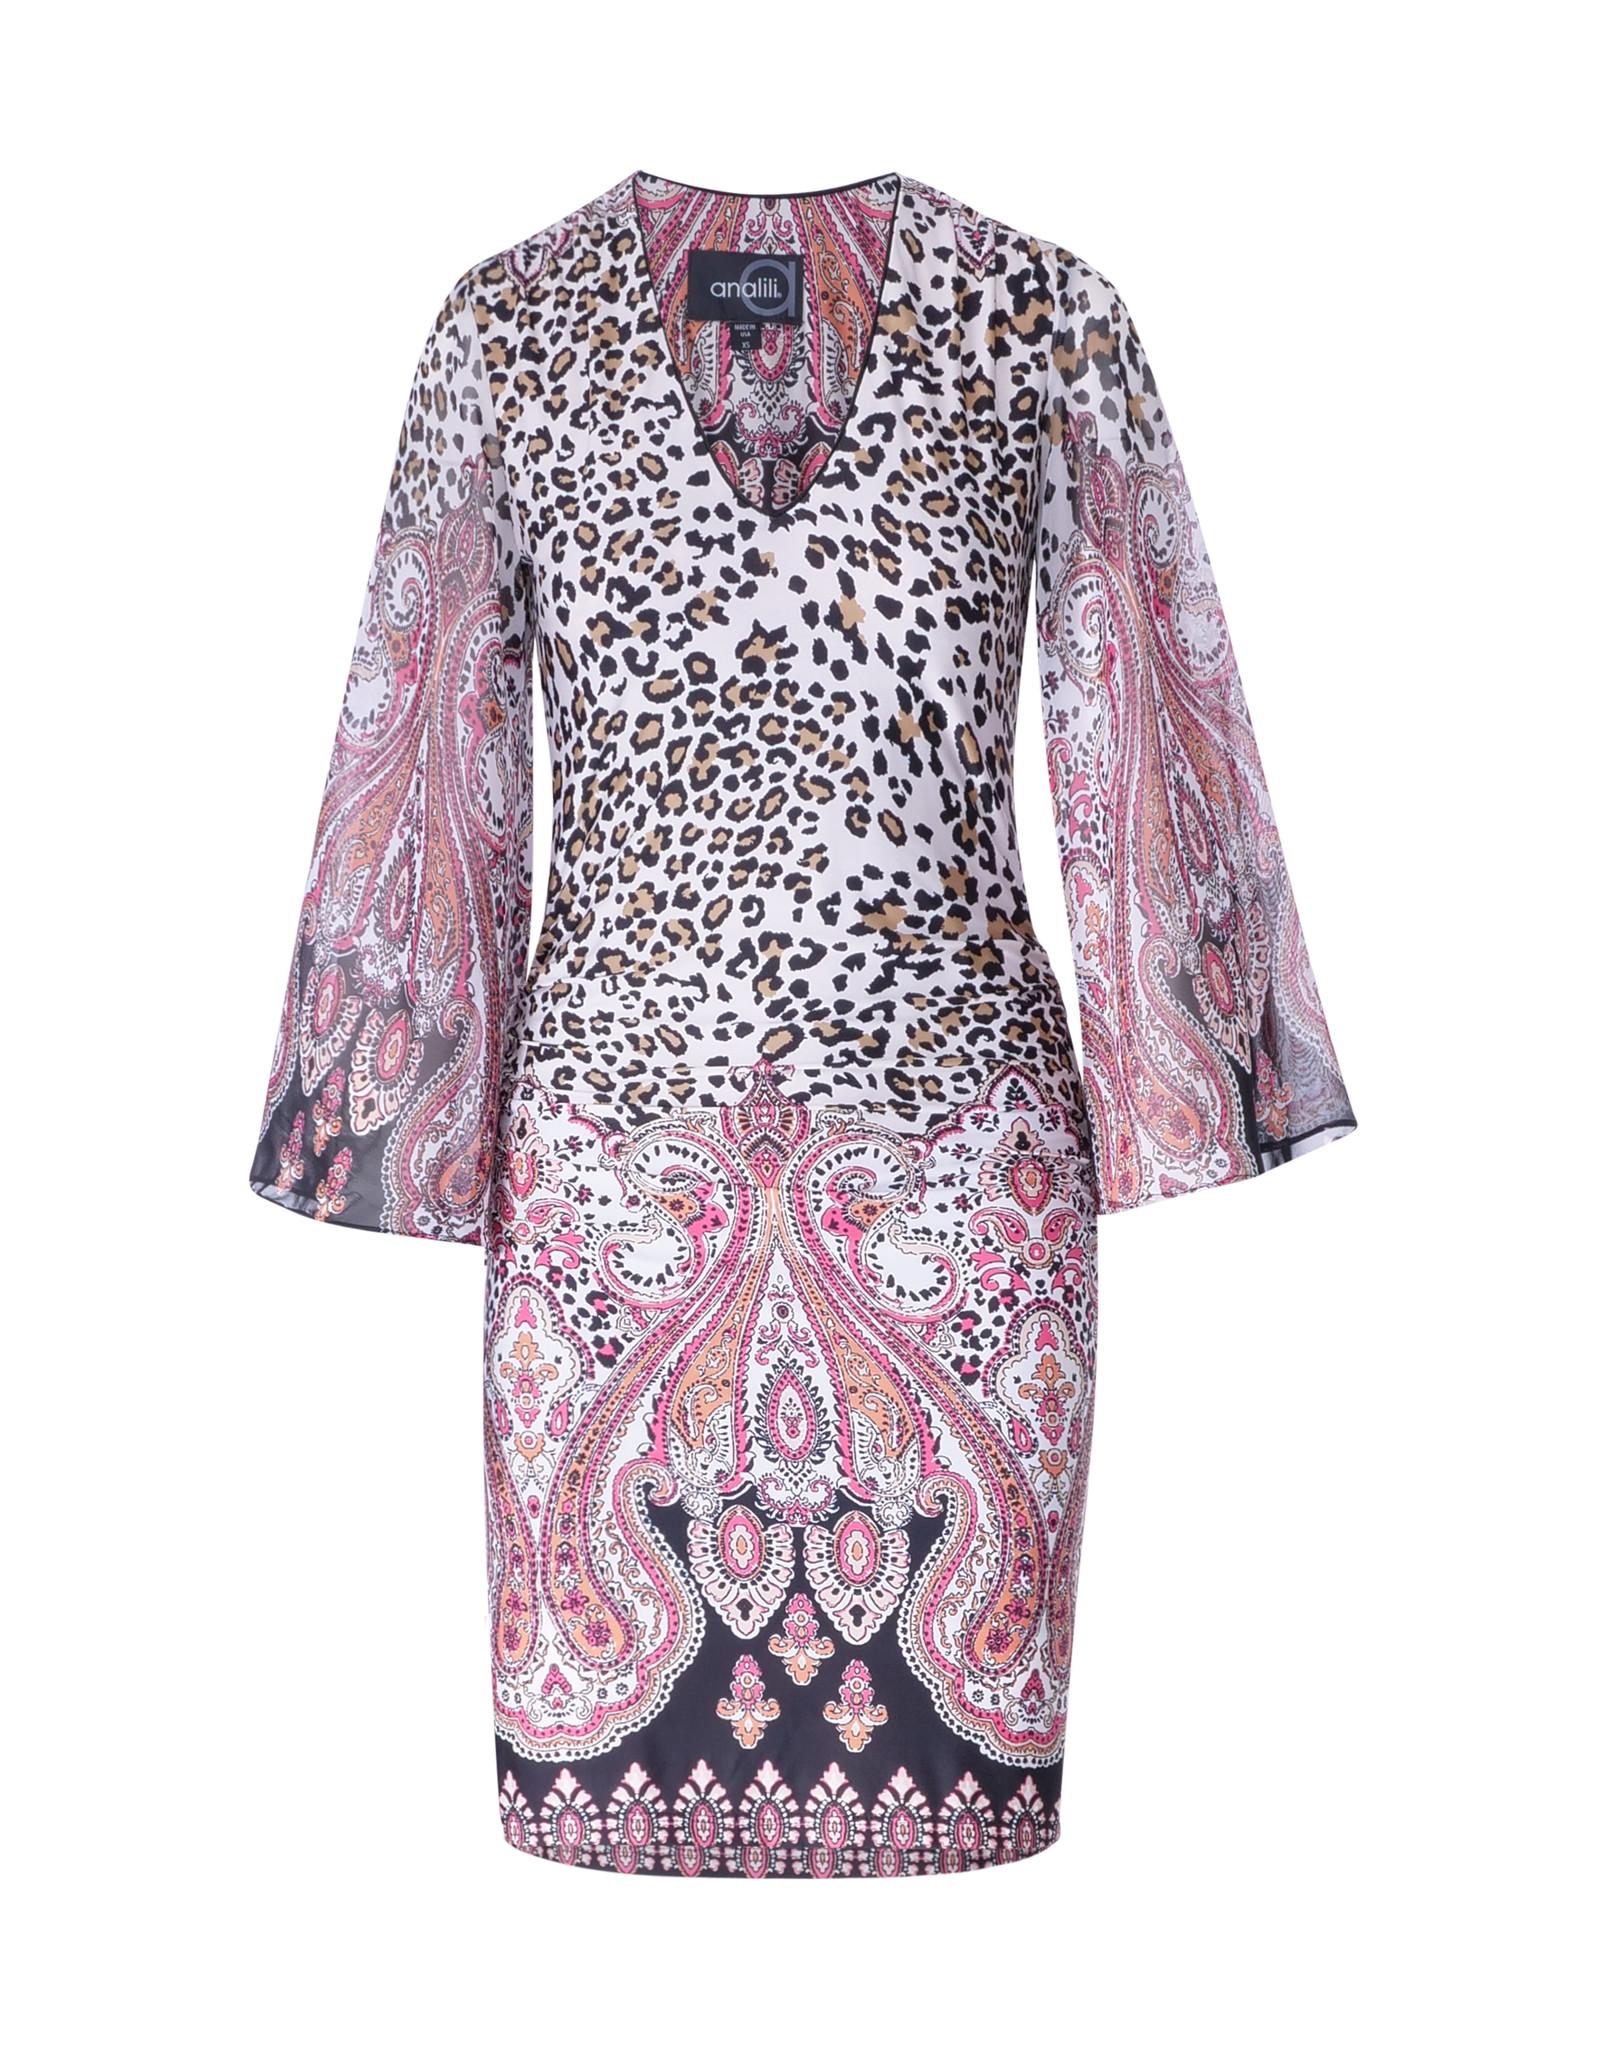 Tania Long Sleeve Dress